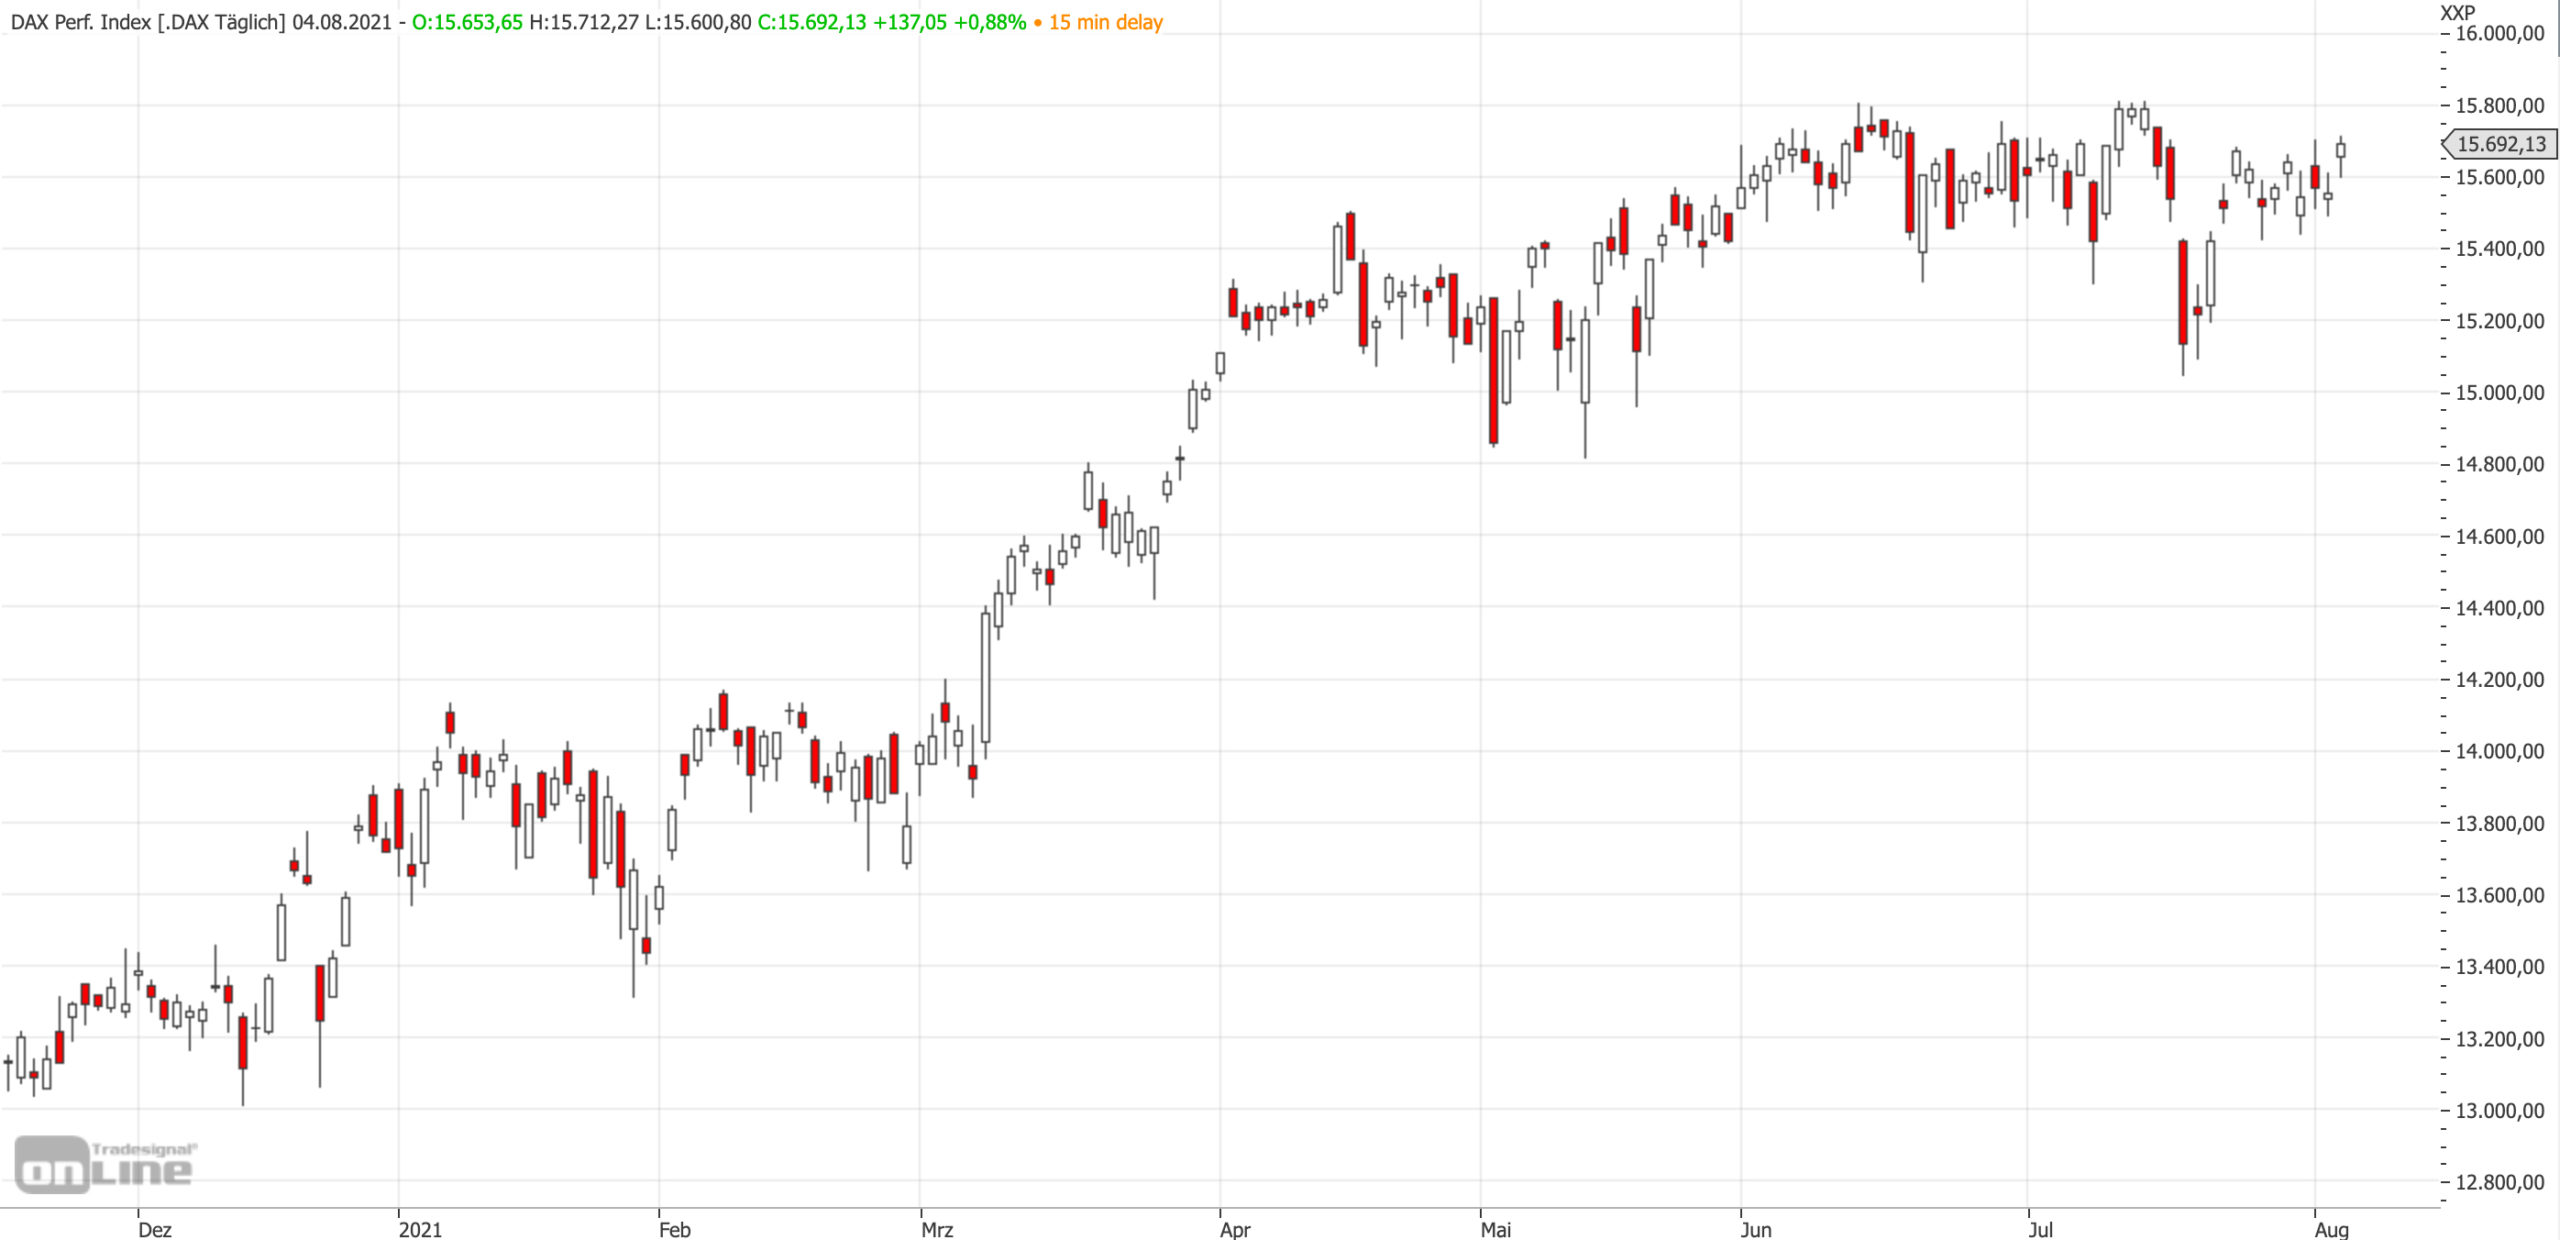 Mittelfristiger DAX-Chart am 04.08.2021